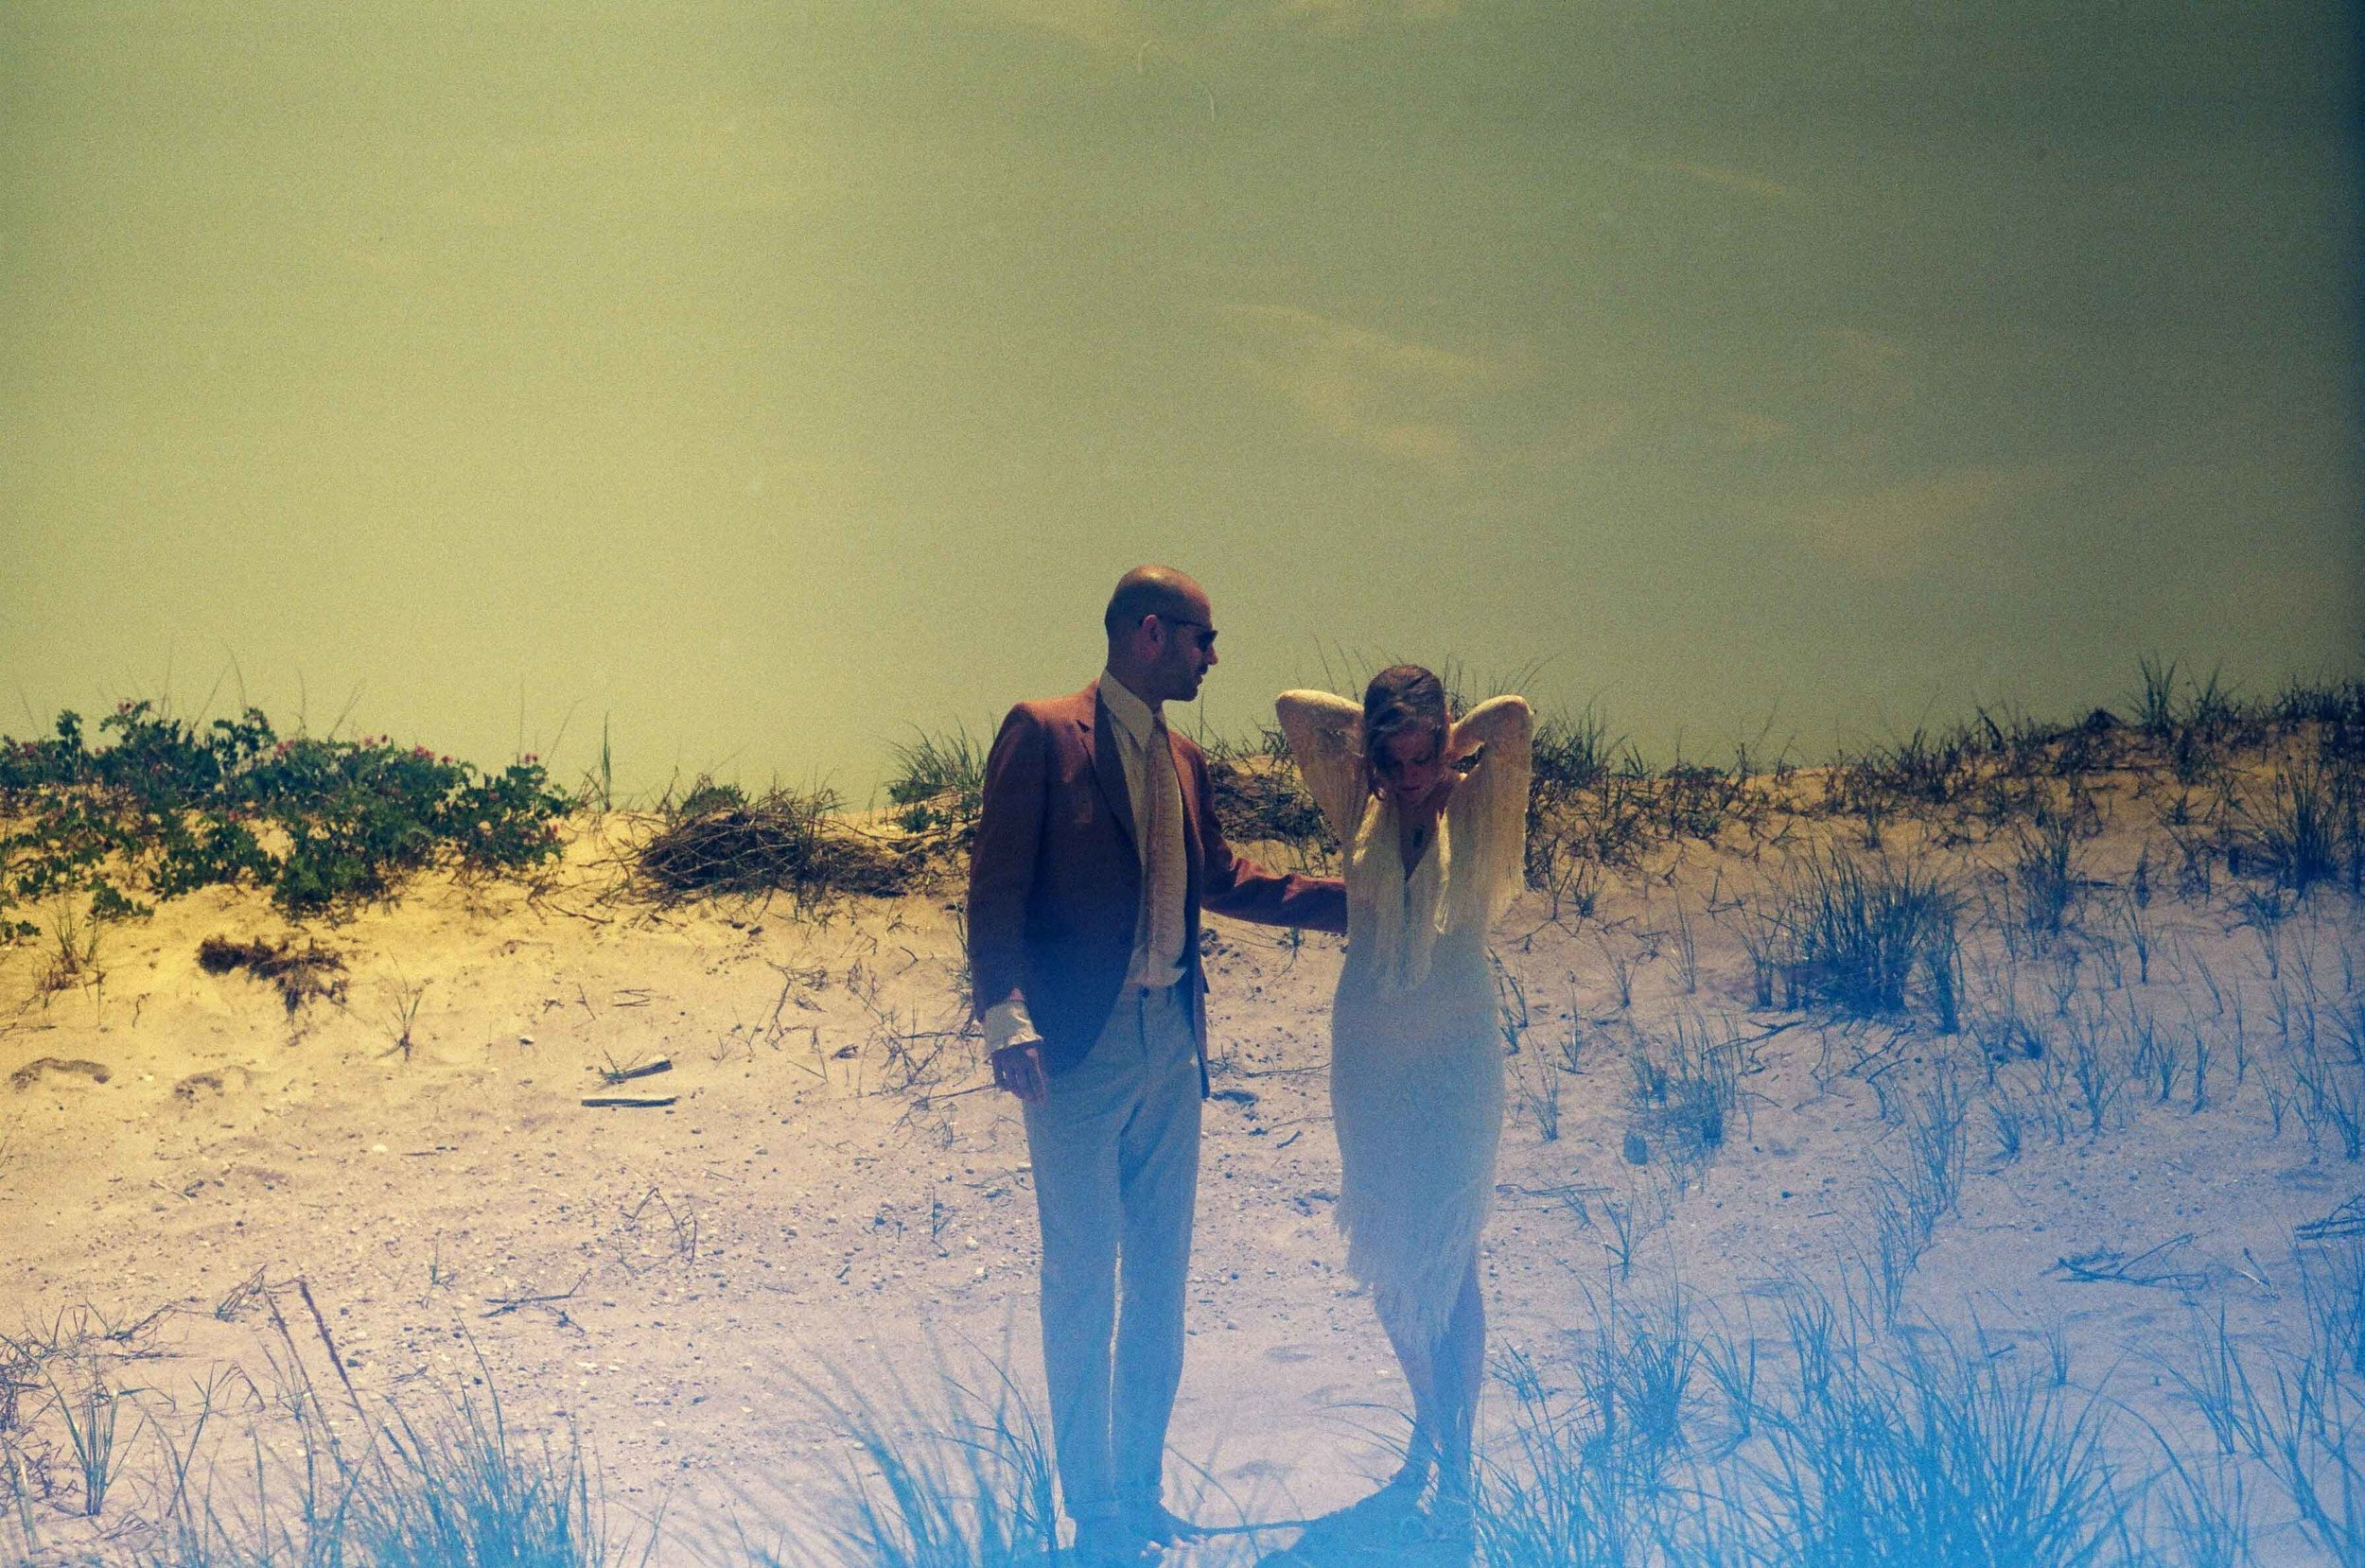 revolog kolor film wedding photography nyc brooklyn bohemian indie rock and roll wedding_ChelliseMichaelPhotography-30.jpg